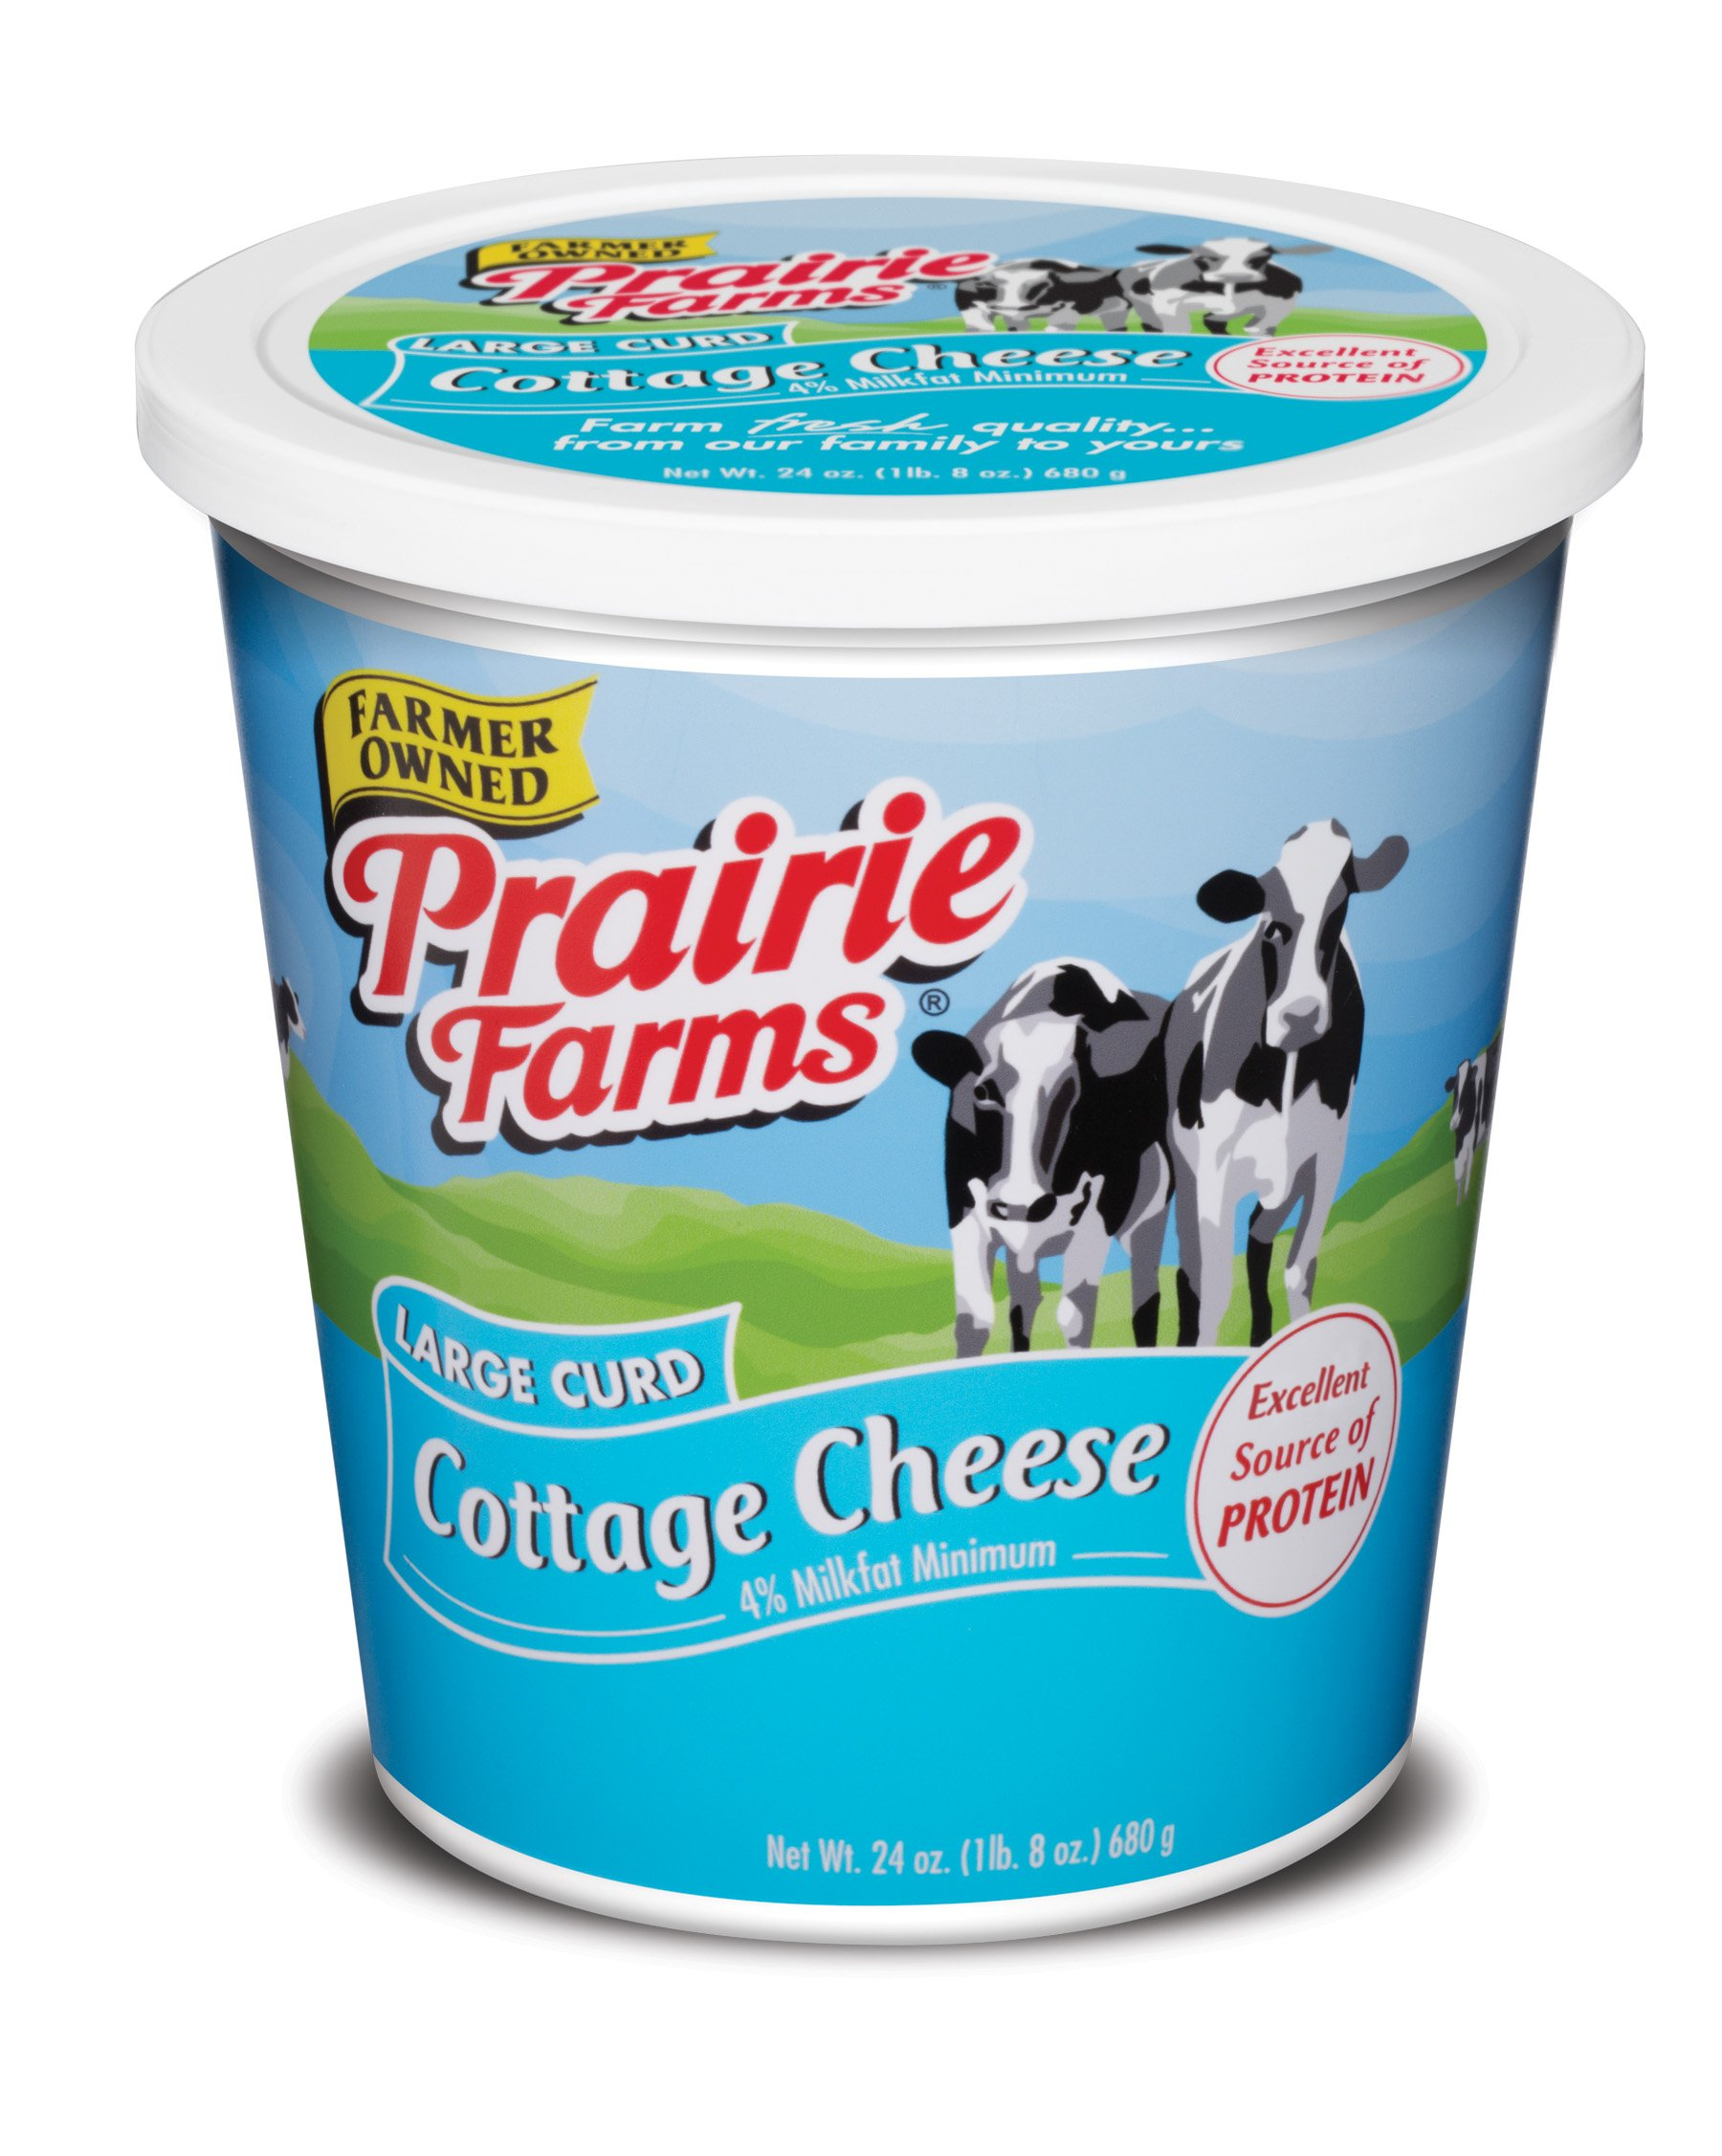 Prairie Farms Dairy Cottage Cheese Large Curd, 24 oz